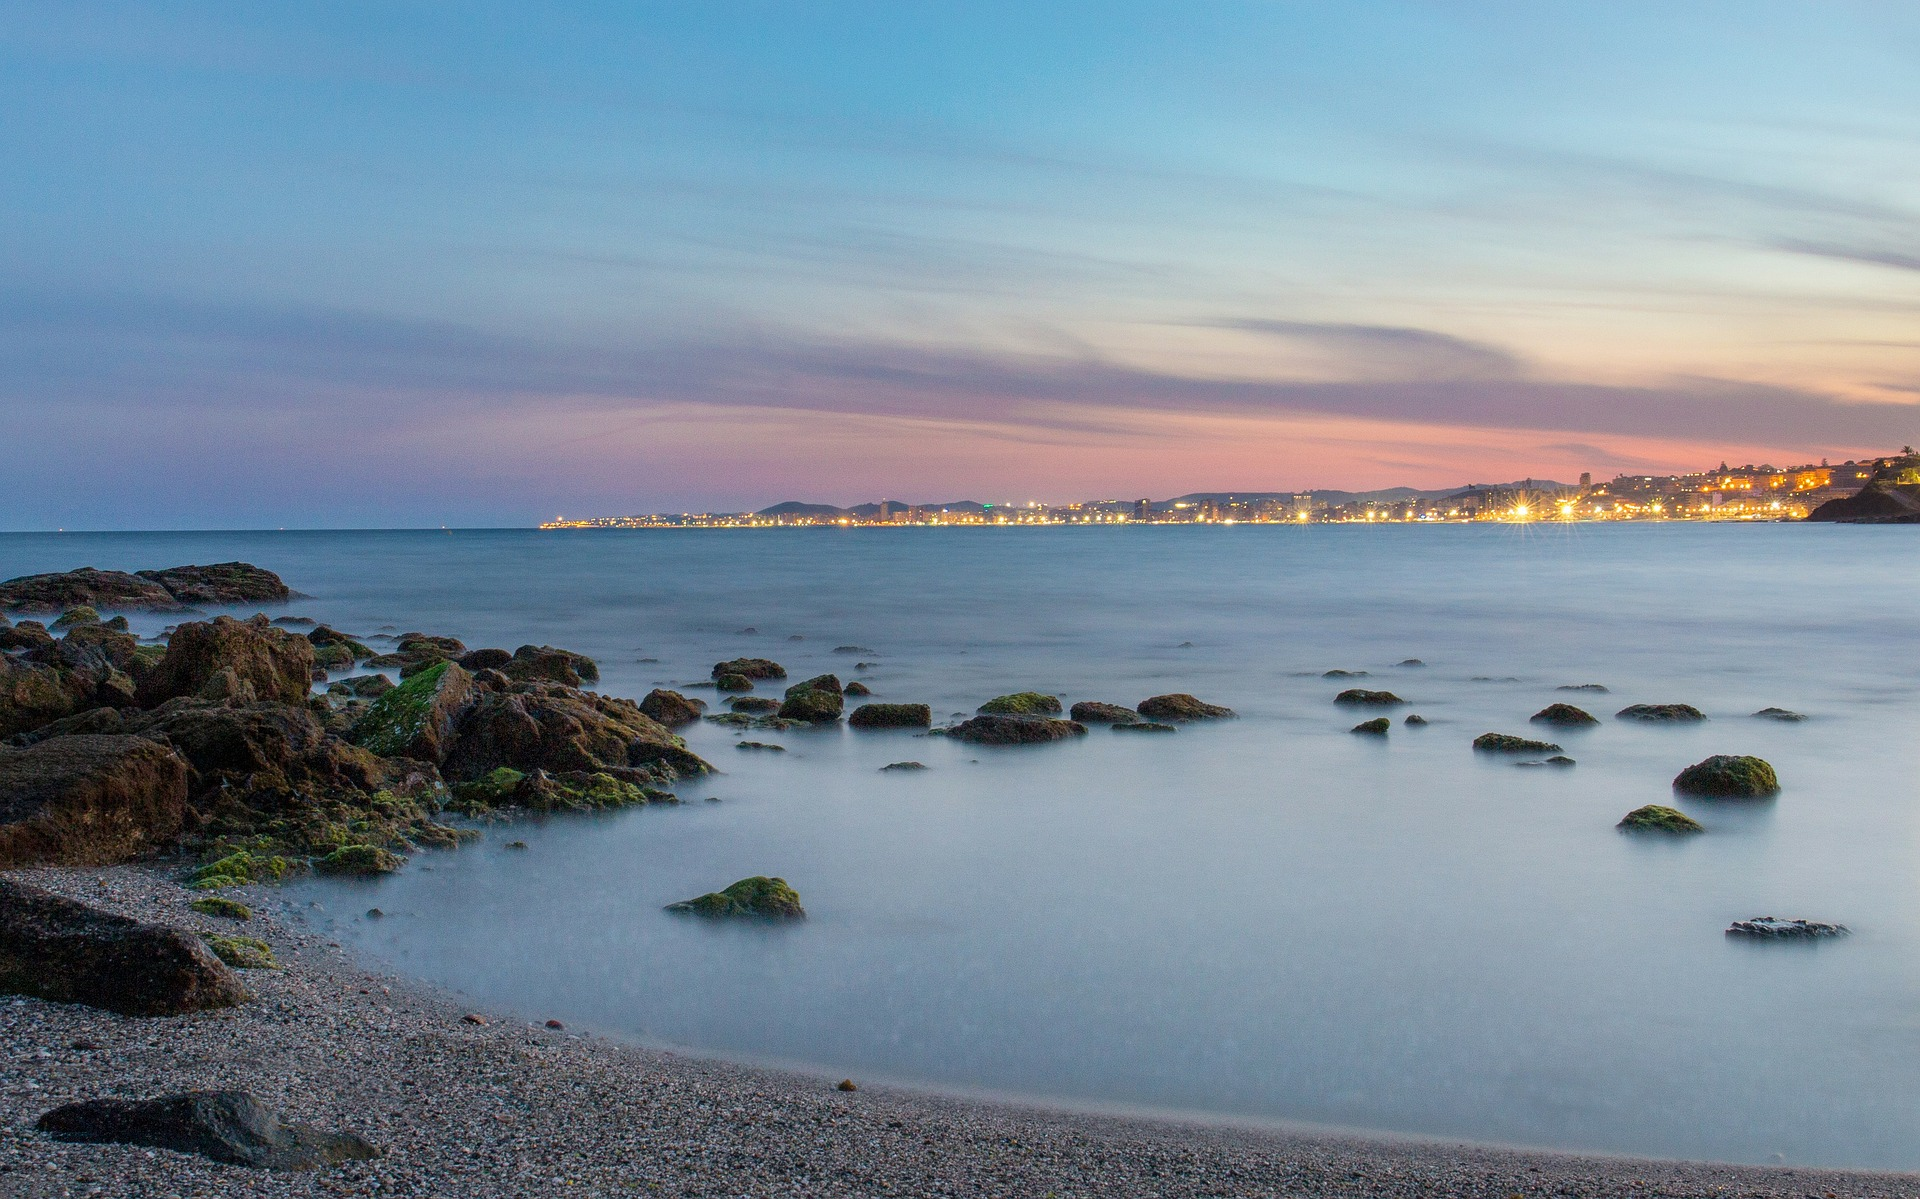 Costa de la Sol Urlaub bei Malaga